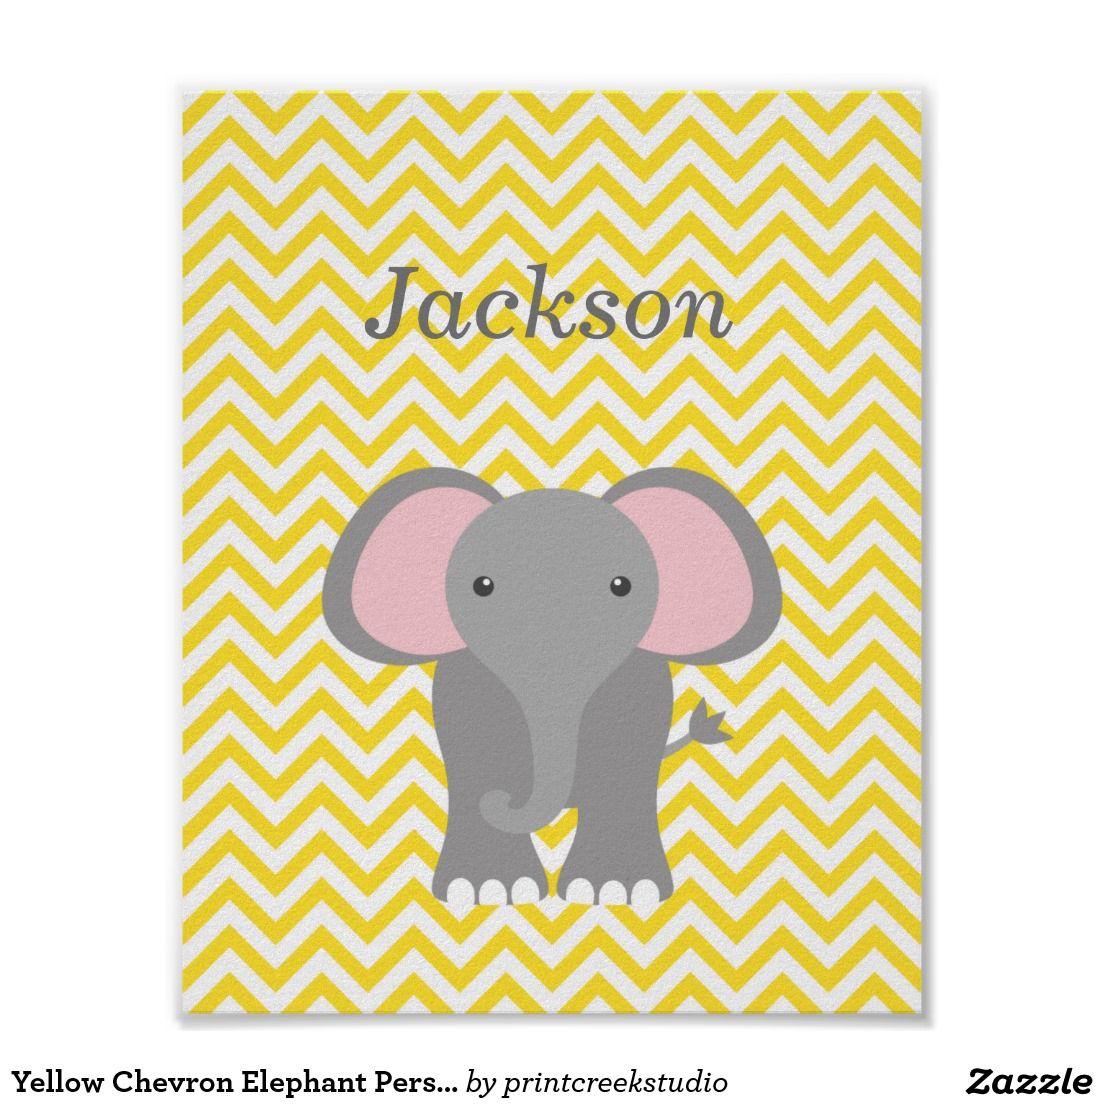 Yellow Chevron Elephant Personalized Nursery Decor | Yellow chevron ...